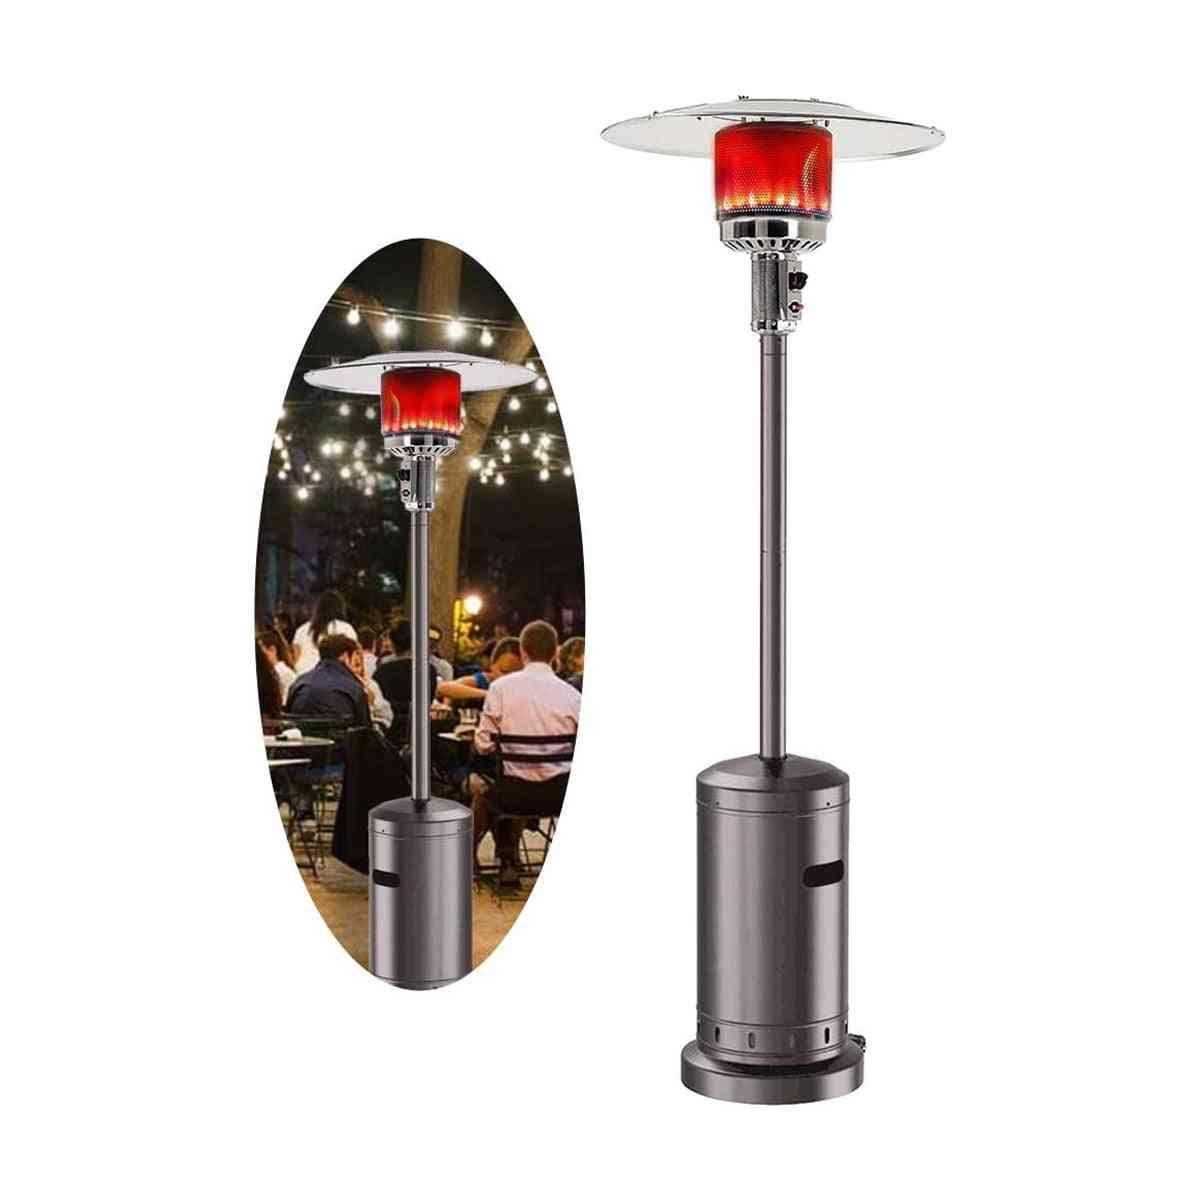 Liquid Propane, Gas Powder Stove, Floorstanding Air Warmer, Umbrella For Outdoor Garden